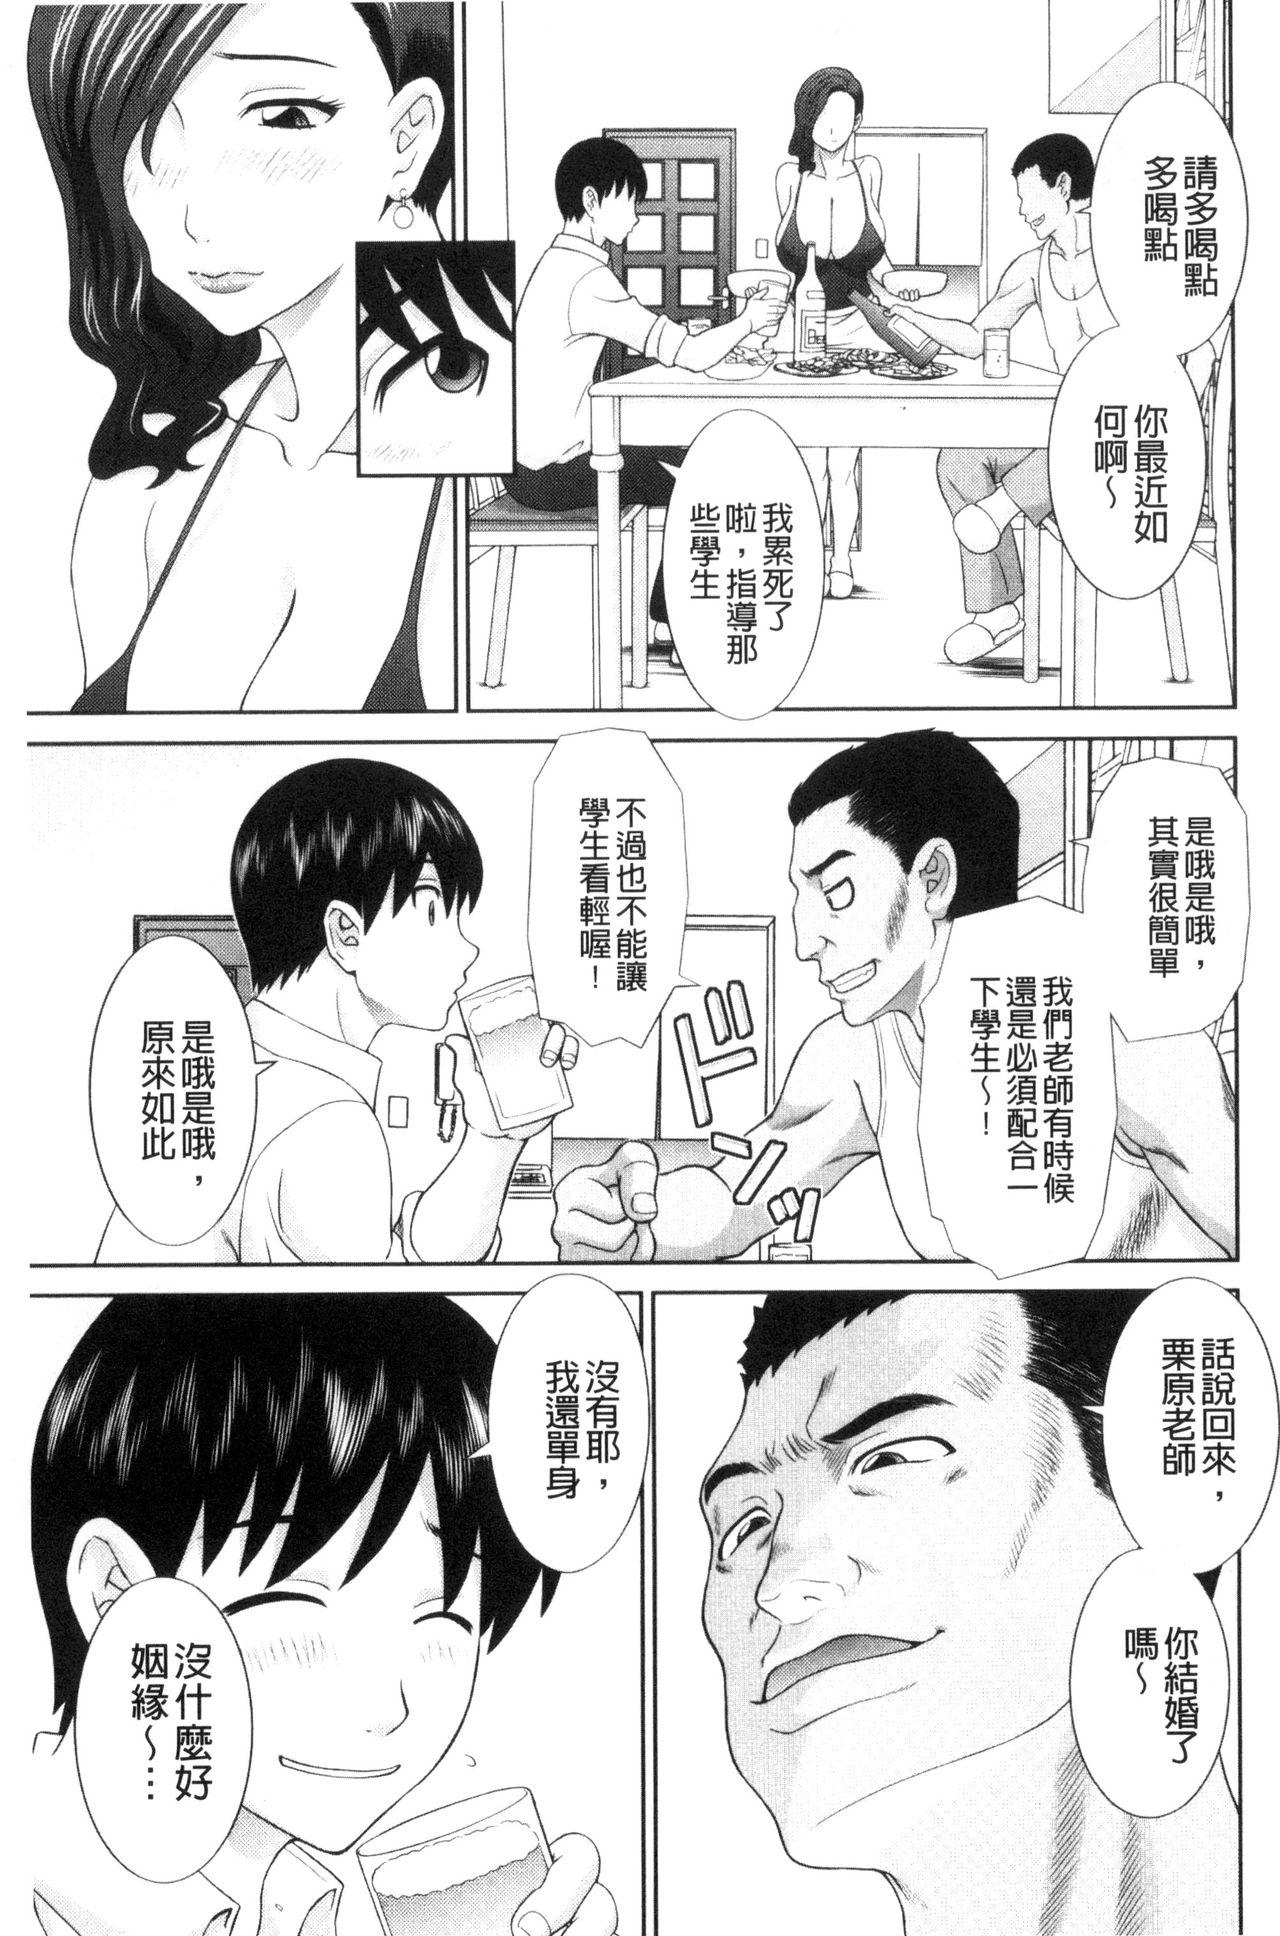 Haramase! Hitozuma Choukyoushi | 受孕吧!人妻調教師 120